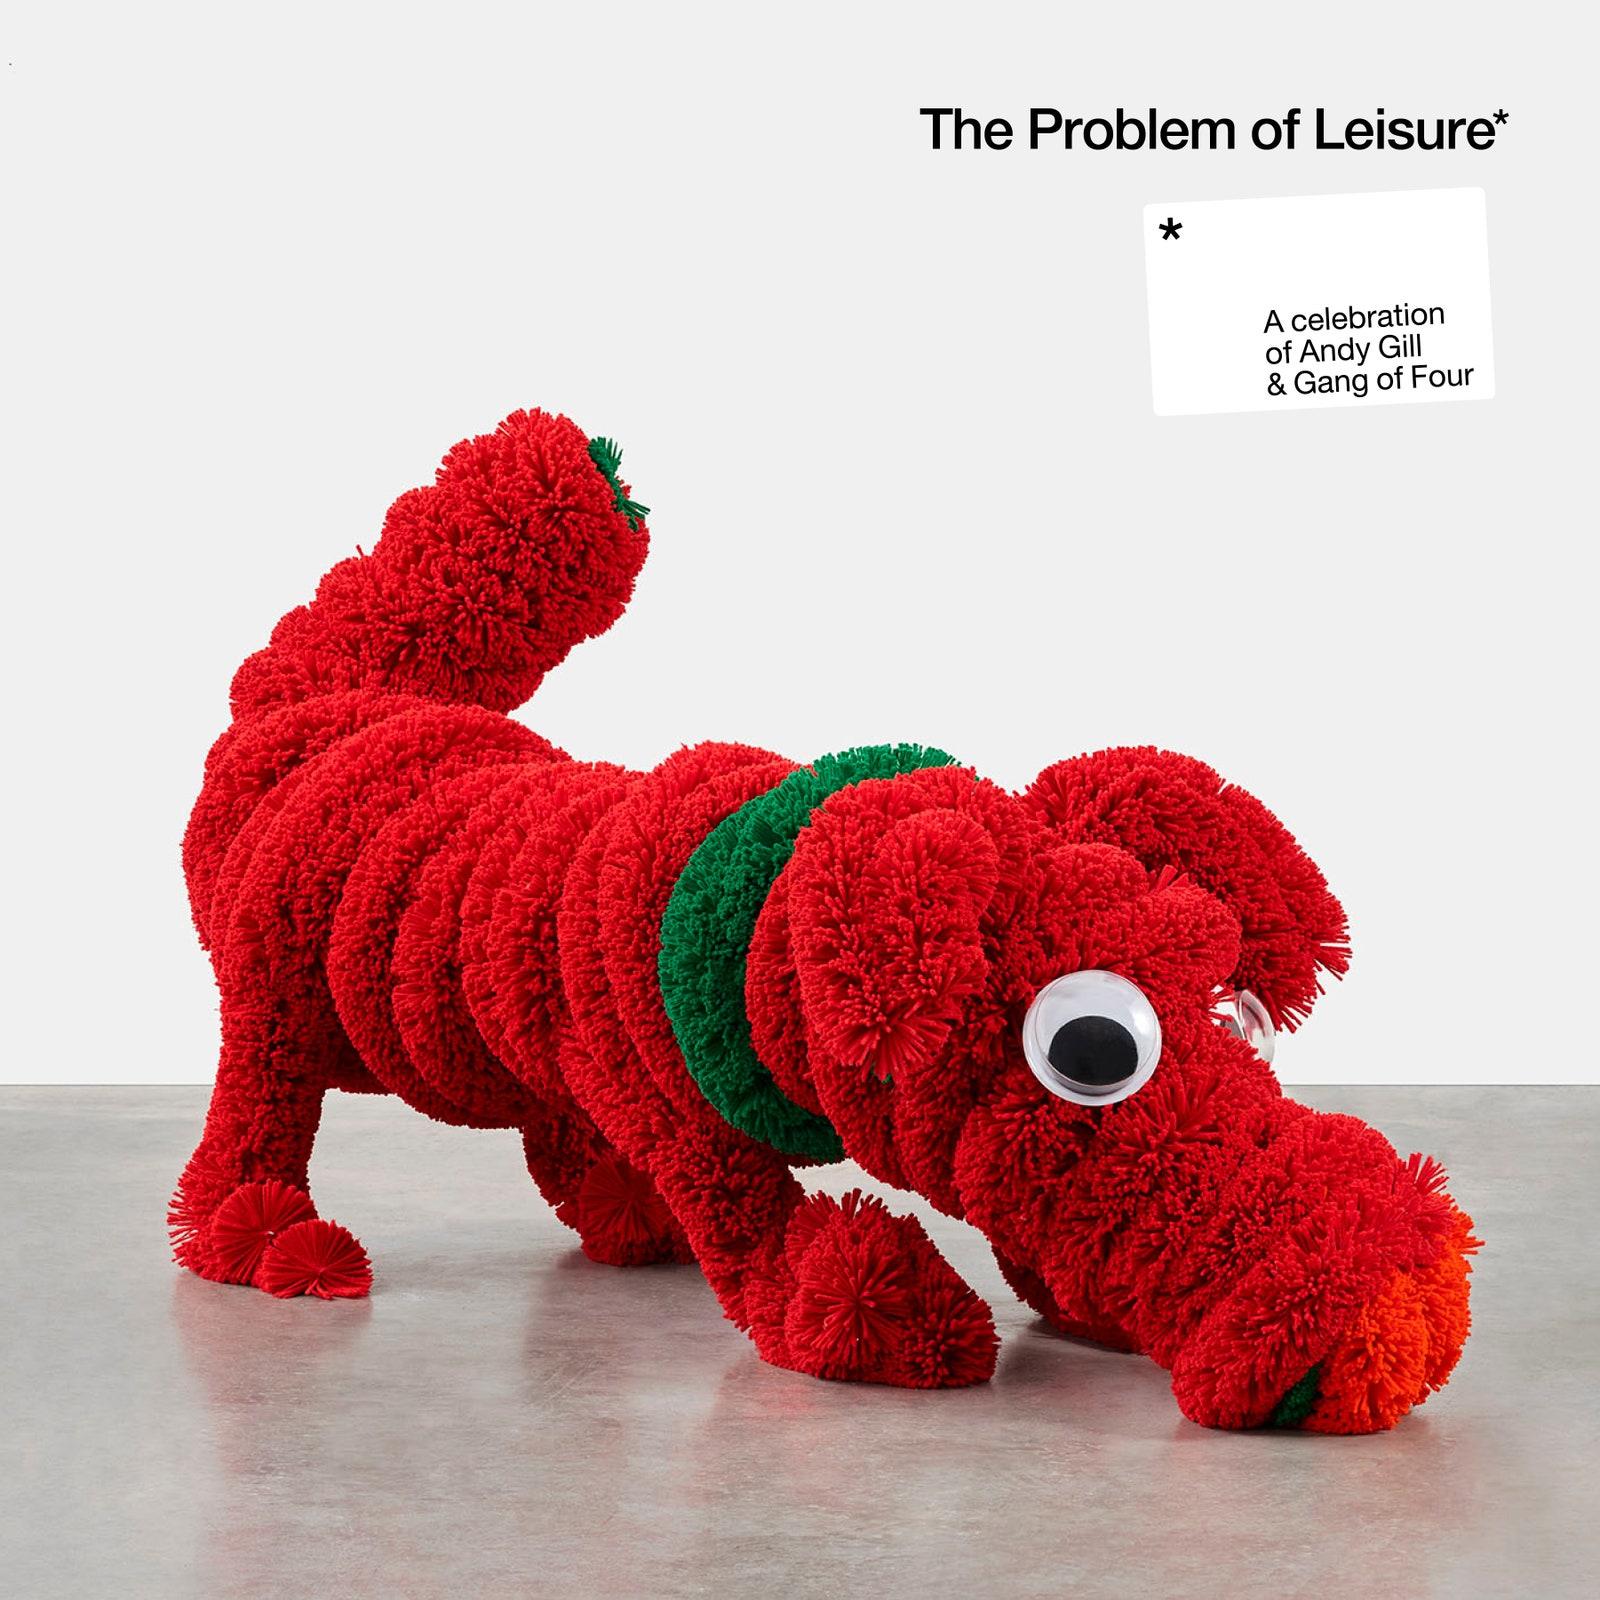 Fluffy red stuffed animal dog